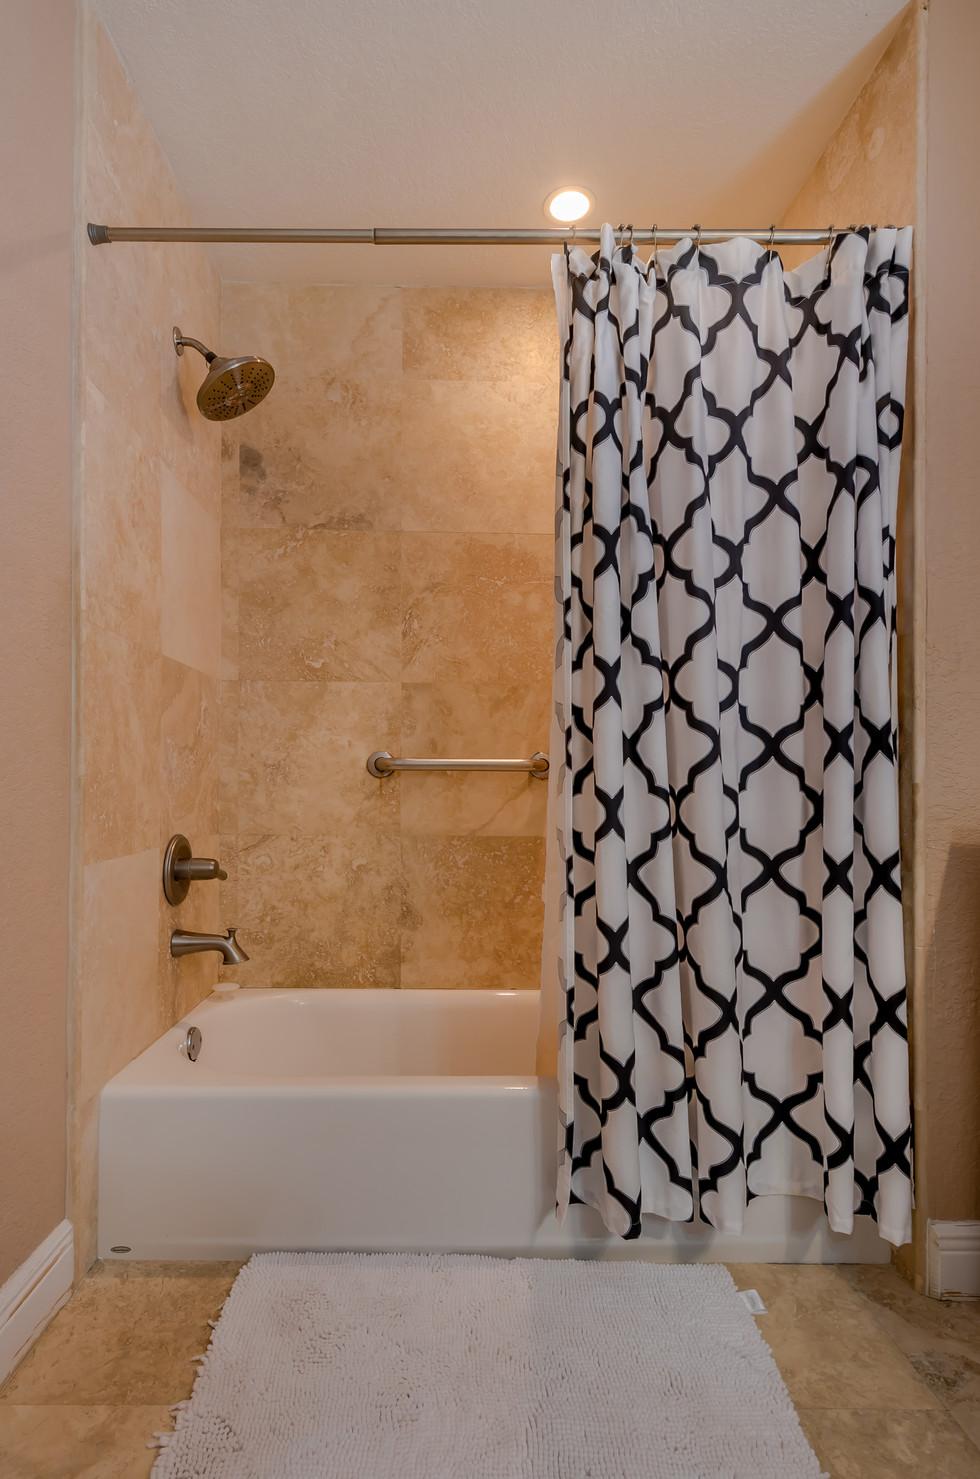 Master Bathroom Remodel Featuring Tub/Shower Combo & Excellent Tile Work